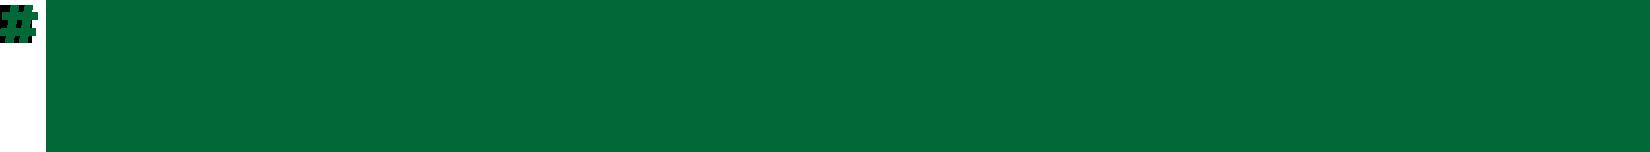 https://keeporegongreen.org/wp-content/uploads/2020/03/OOO_Title_Green.png